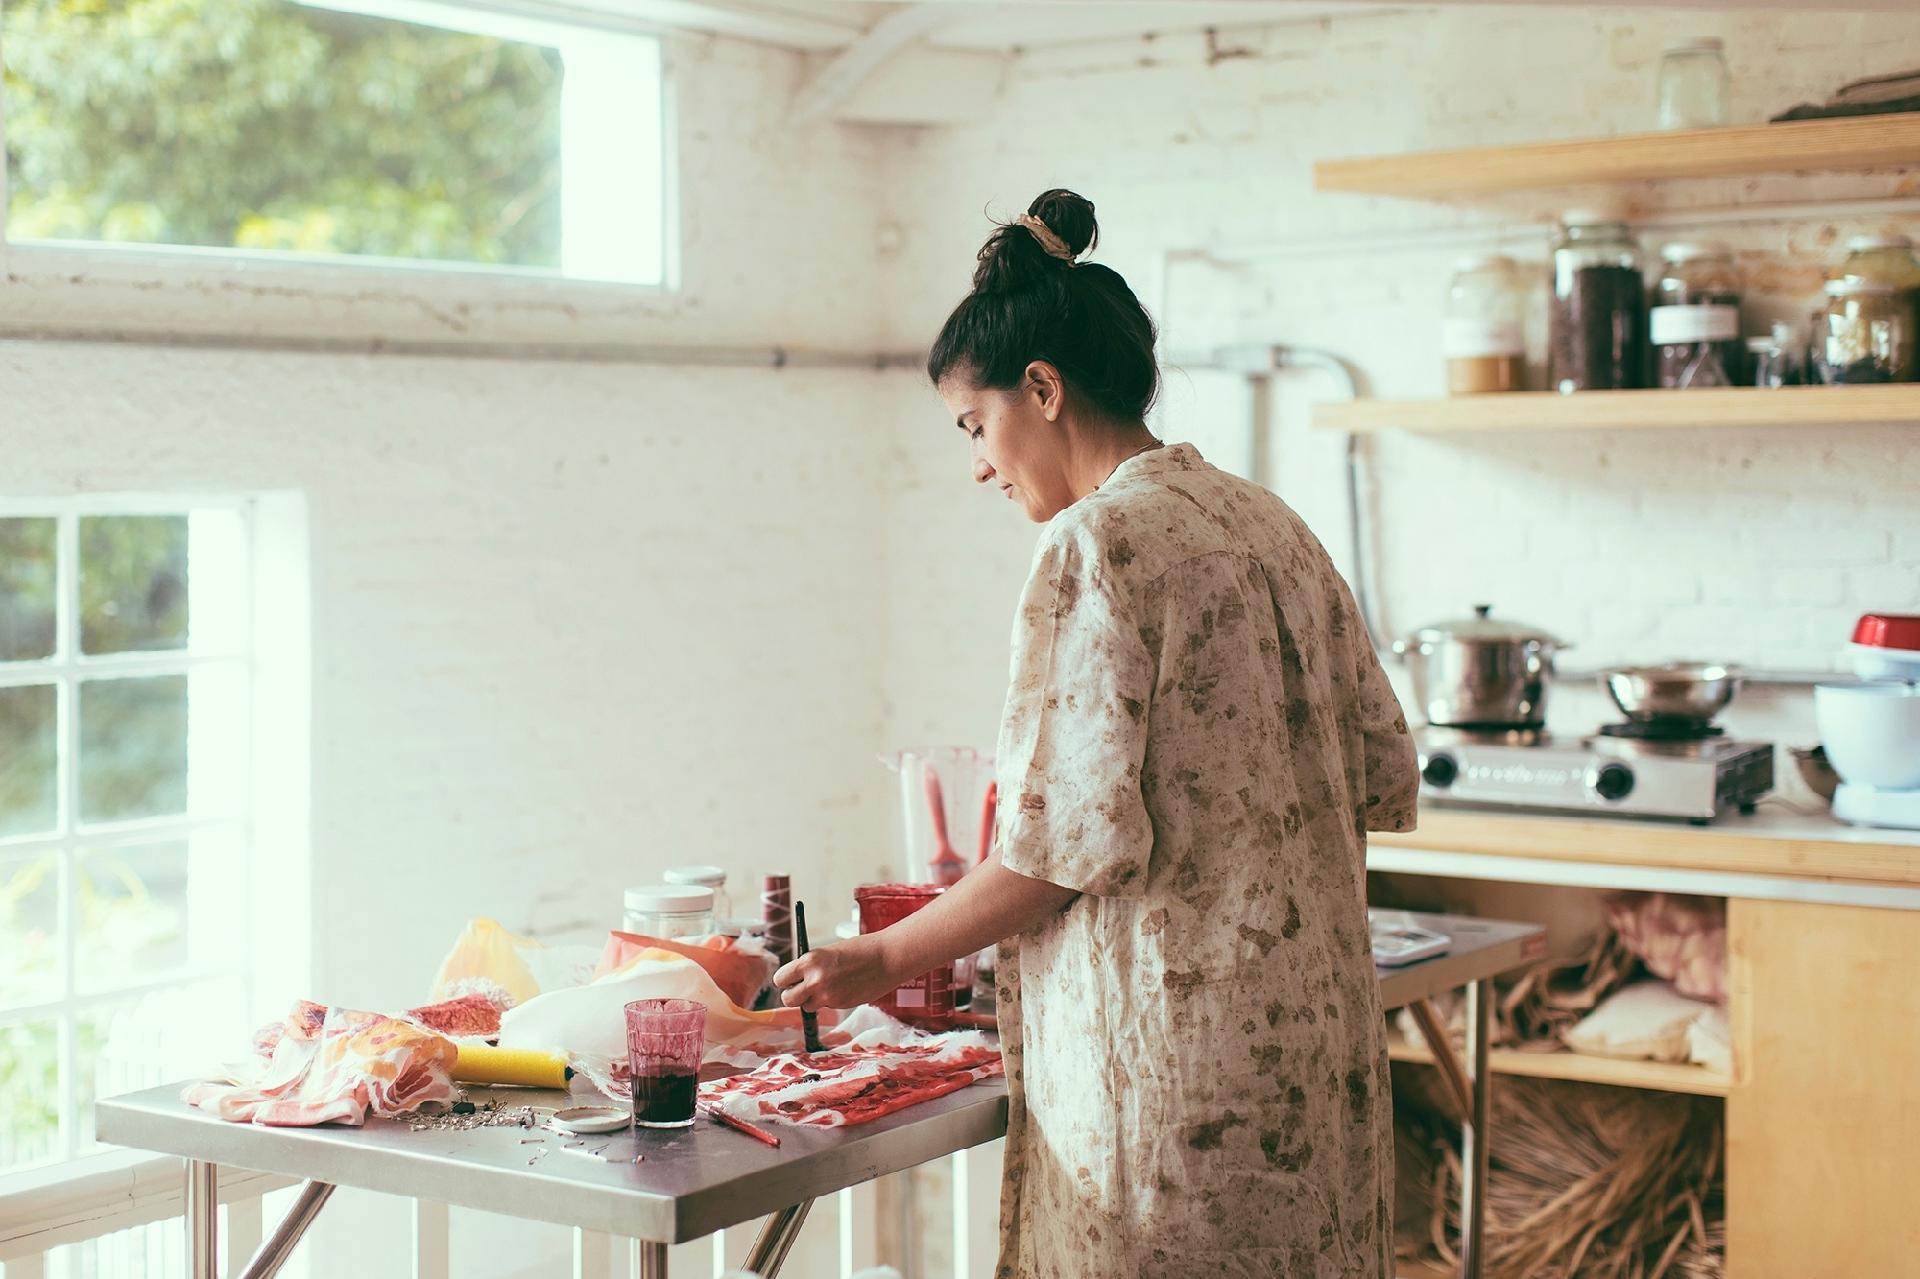 Julia Rodrigues/UOL